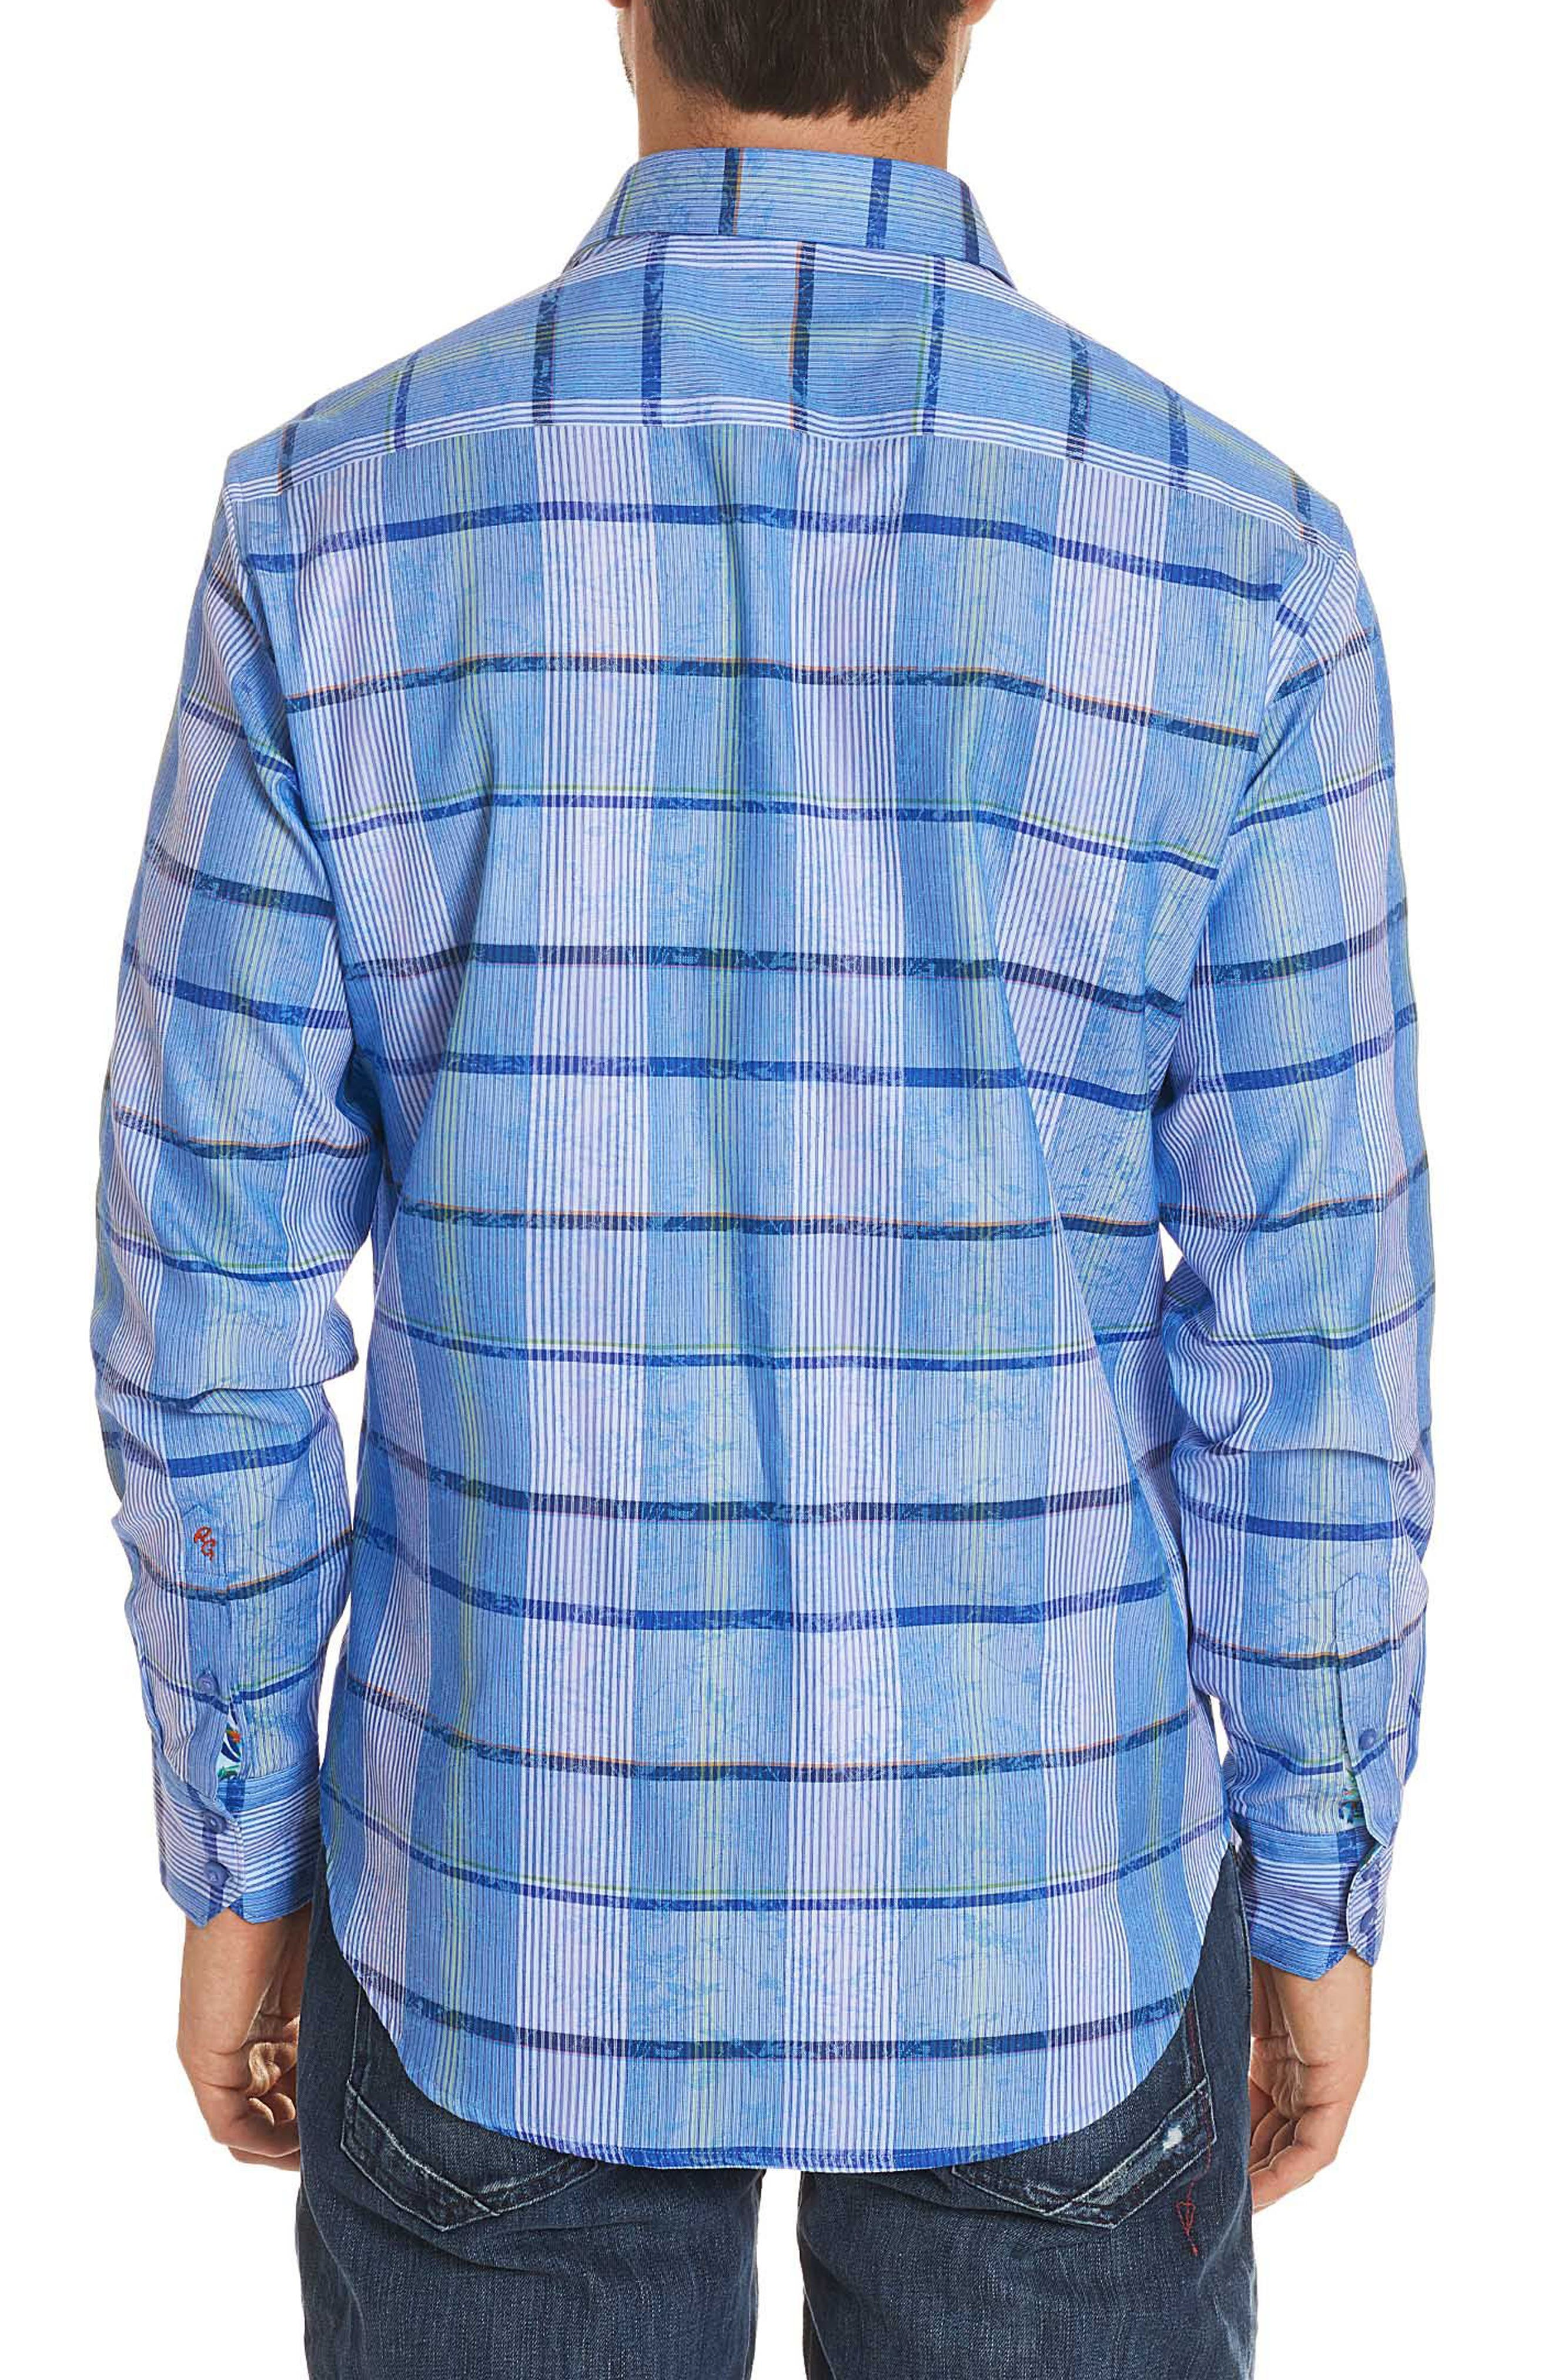 Ferro Classic Fit Sport Shirt,                             Alternate thumbnail 2, color,                             Blue